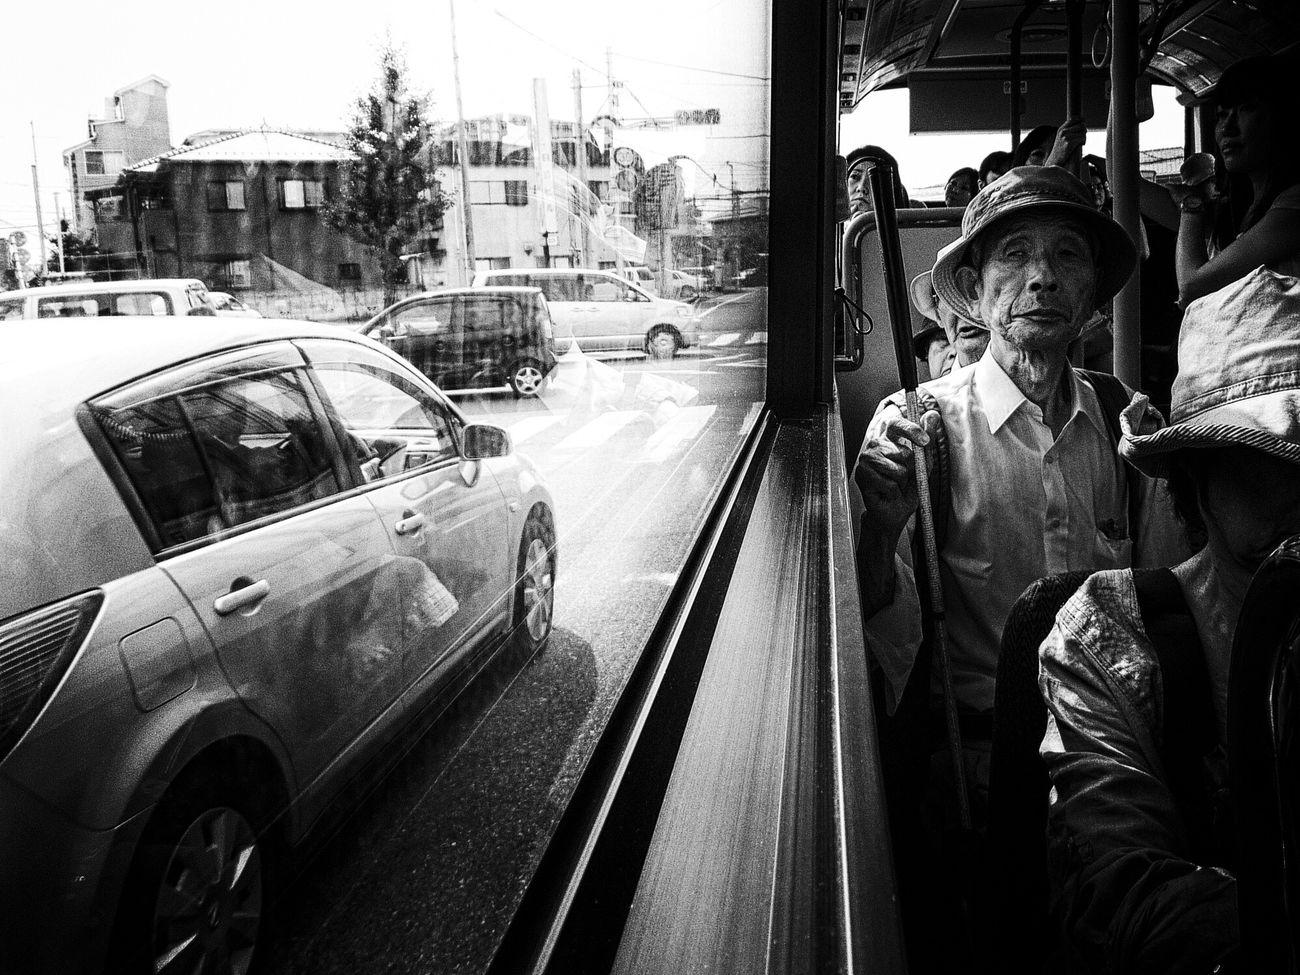 PEOPLE IN BUS